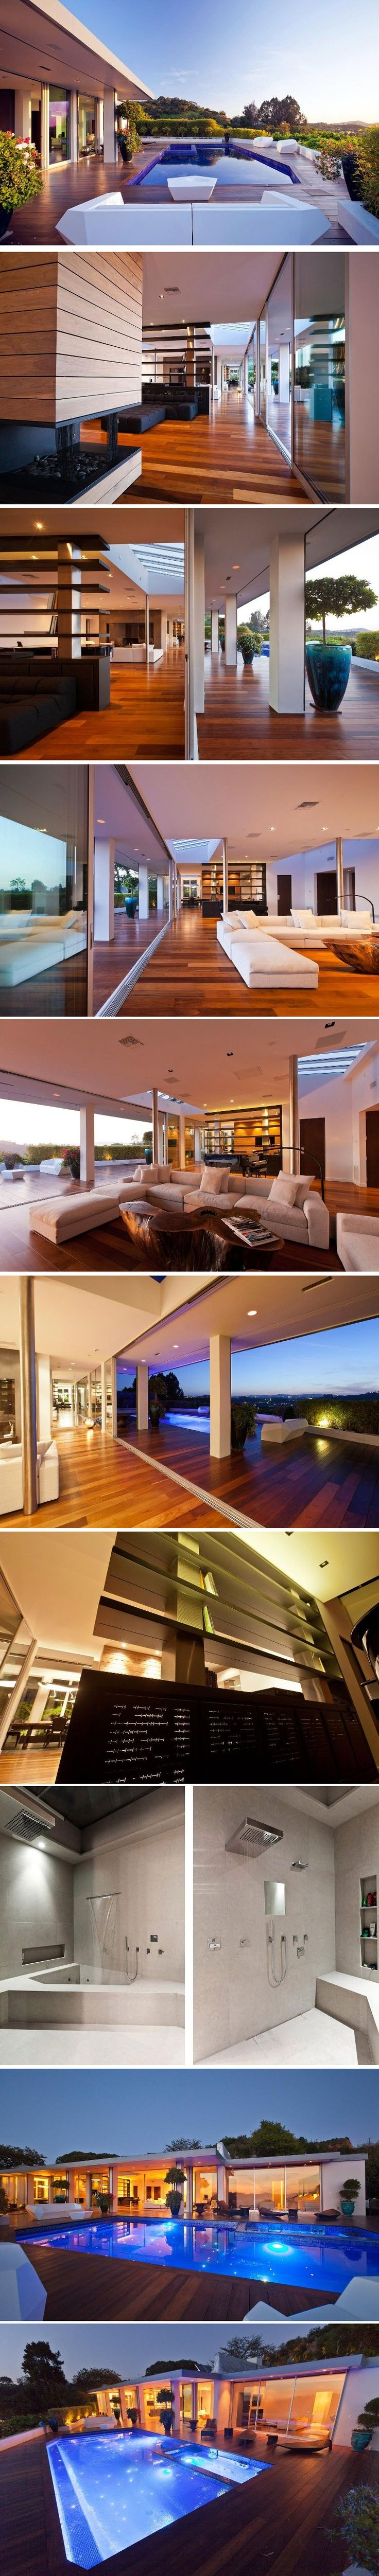 House in Beverly Hills by Jendretzki